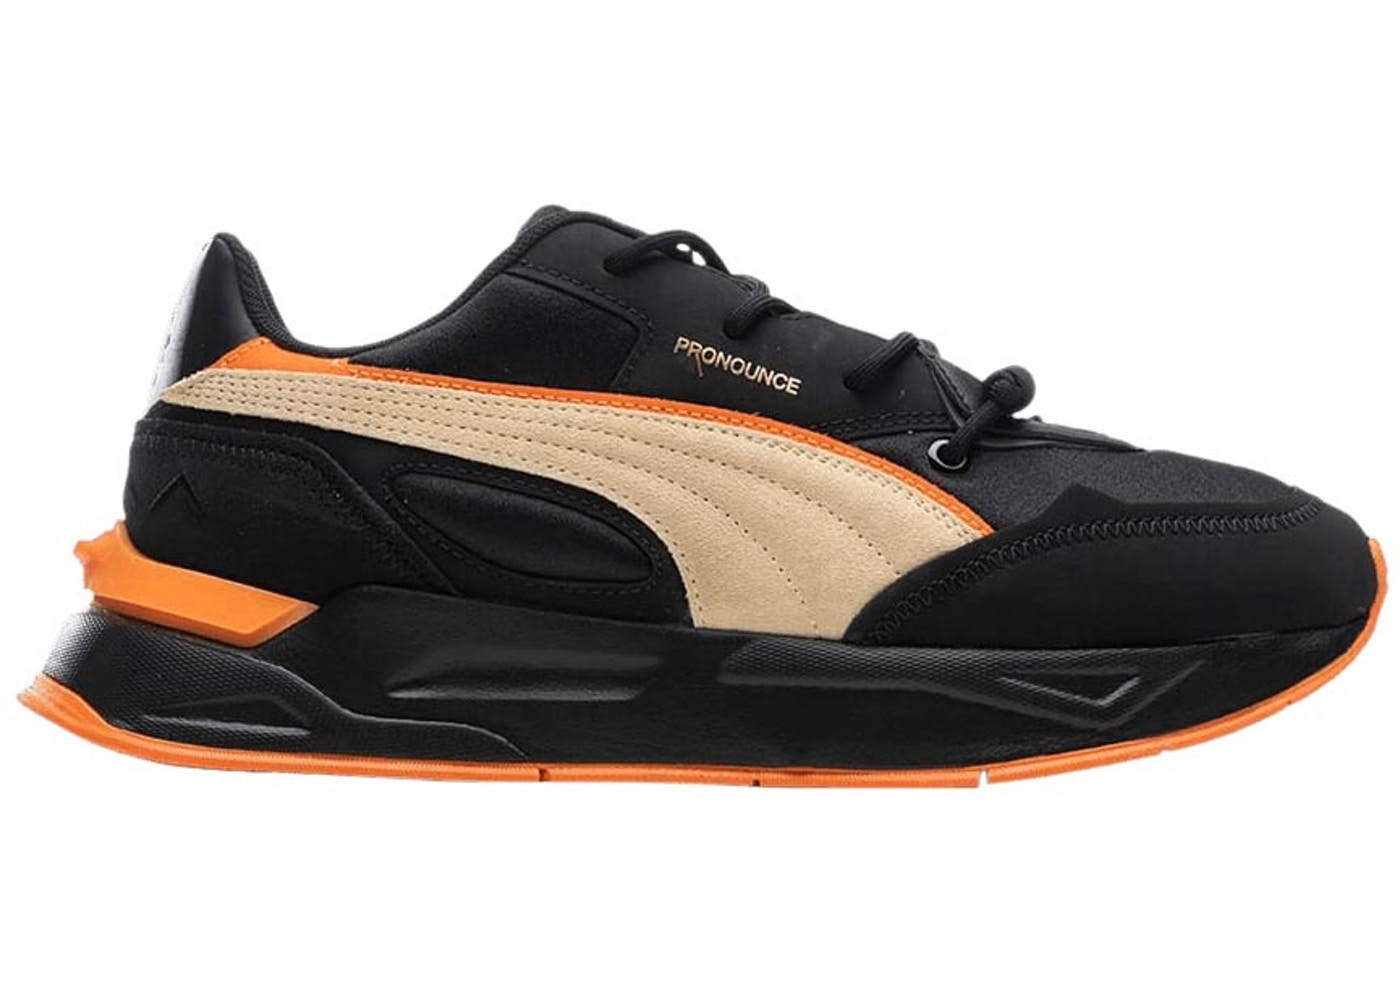 Puma Mirage Sport Pronounce Black Pebble